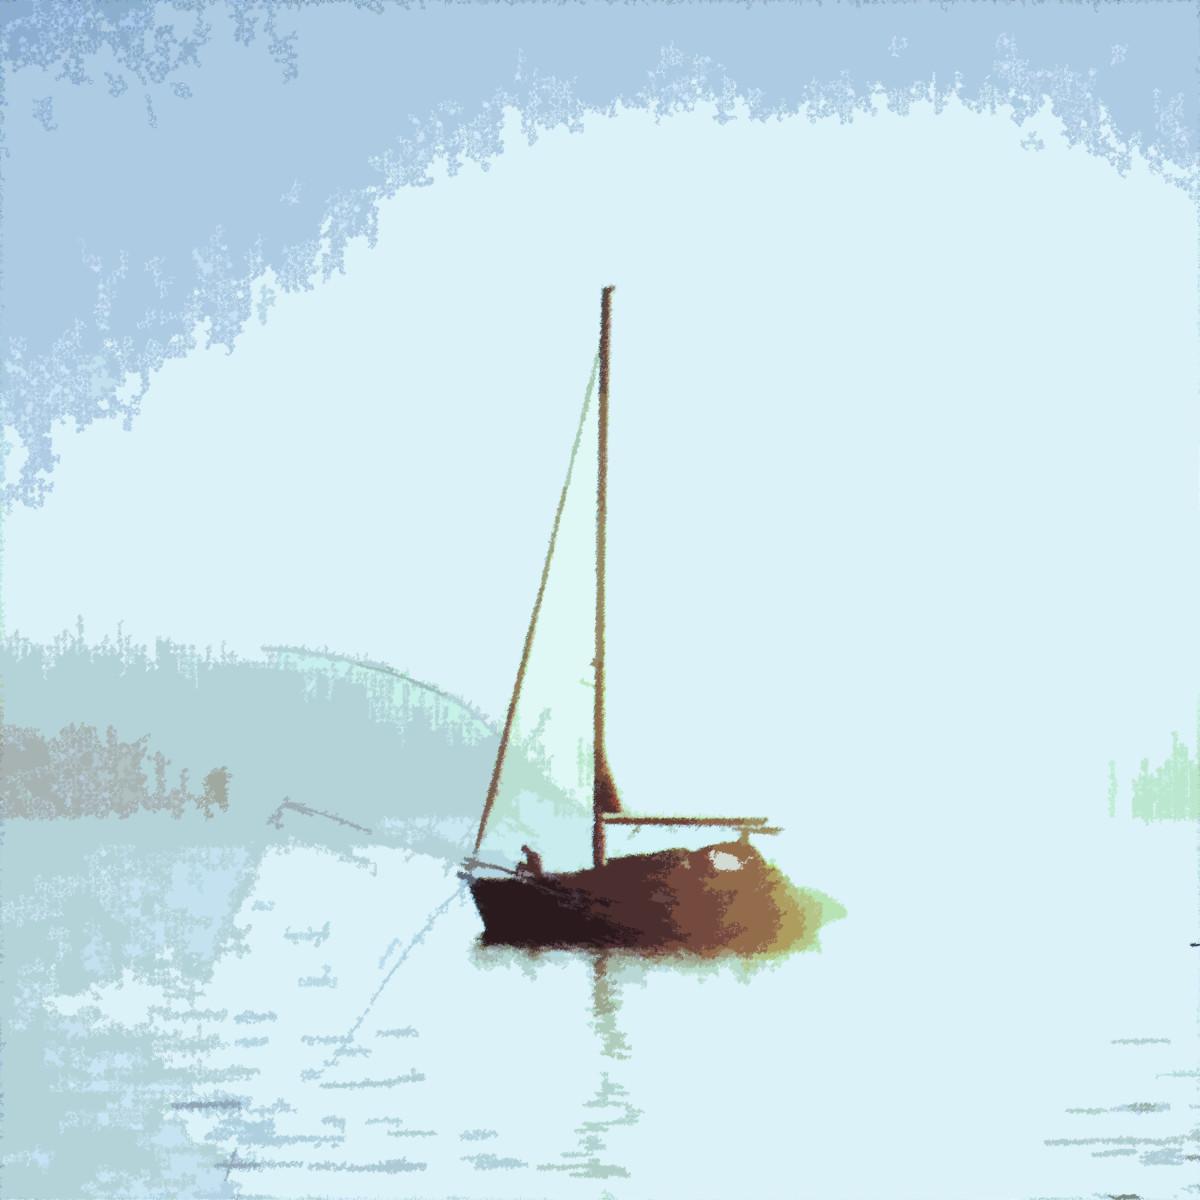 Sails Down by Gina Godfrey